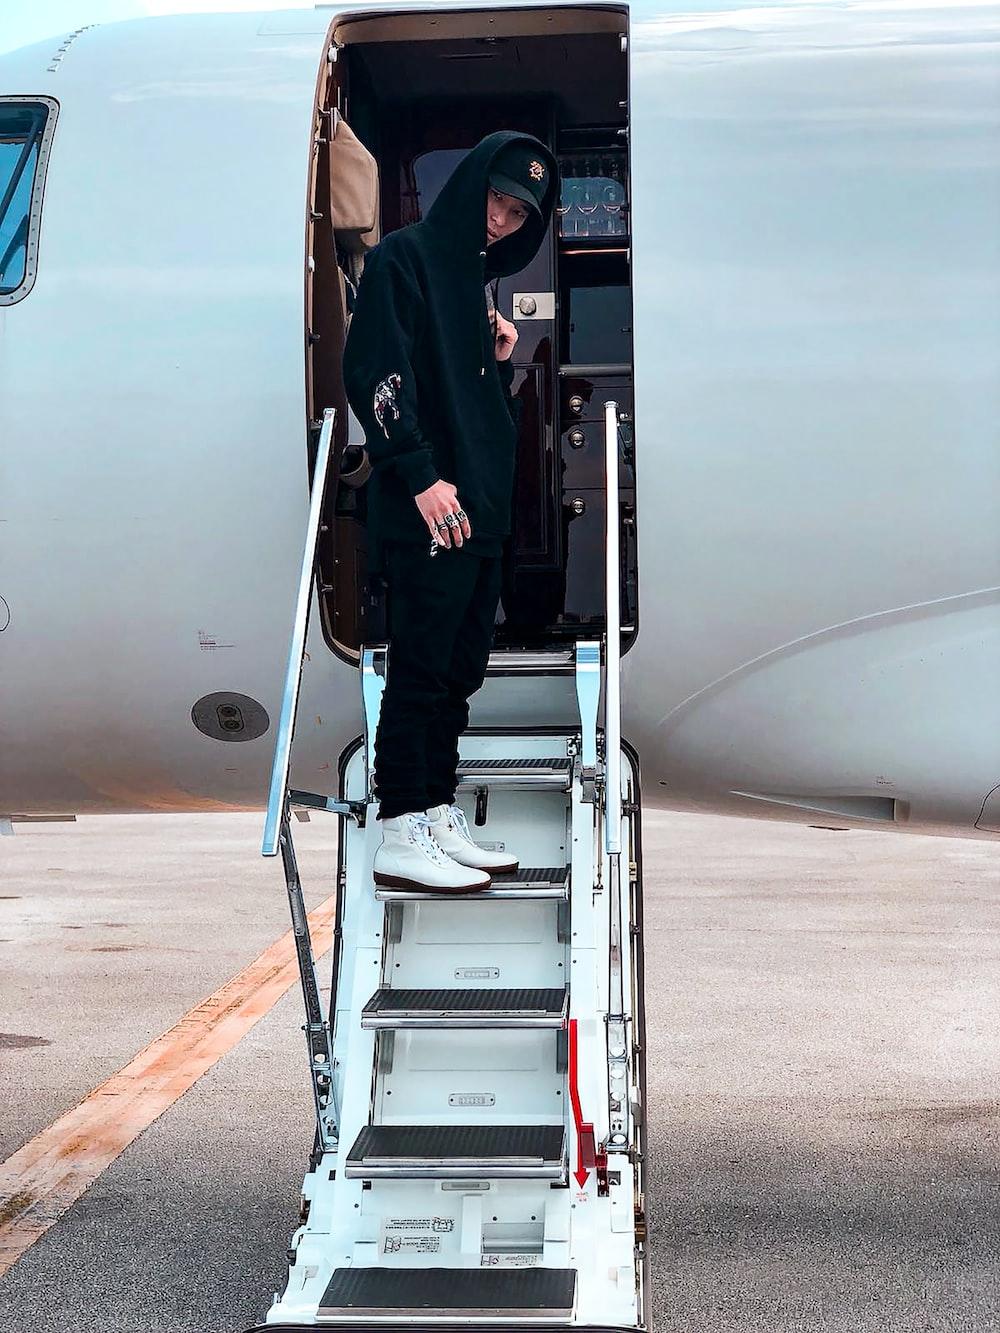 person stepping on passenger plane ladder